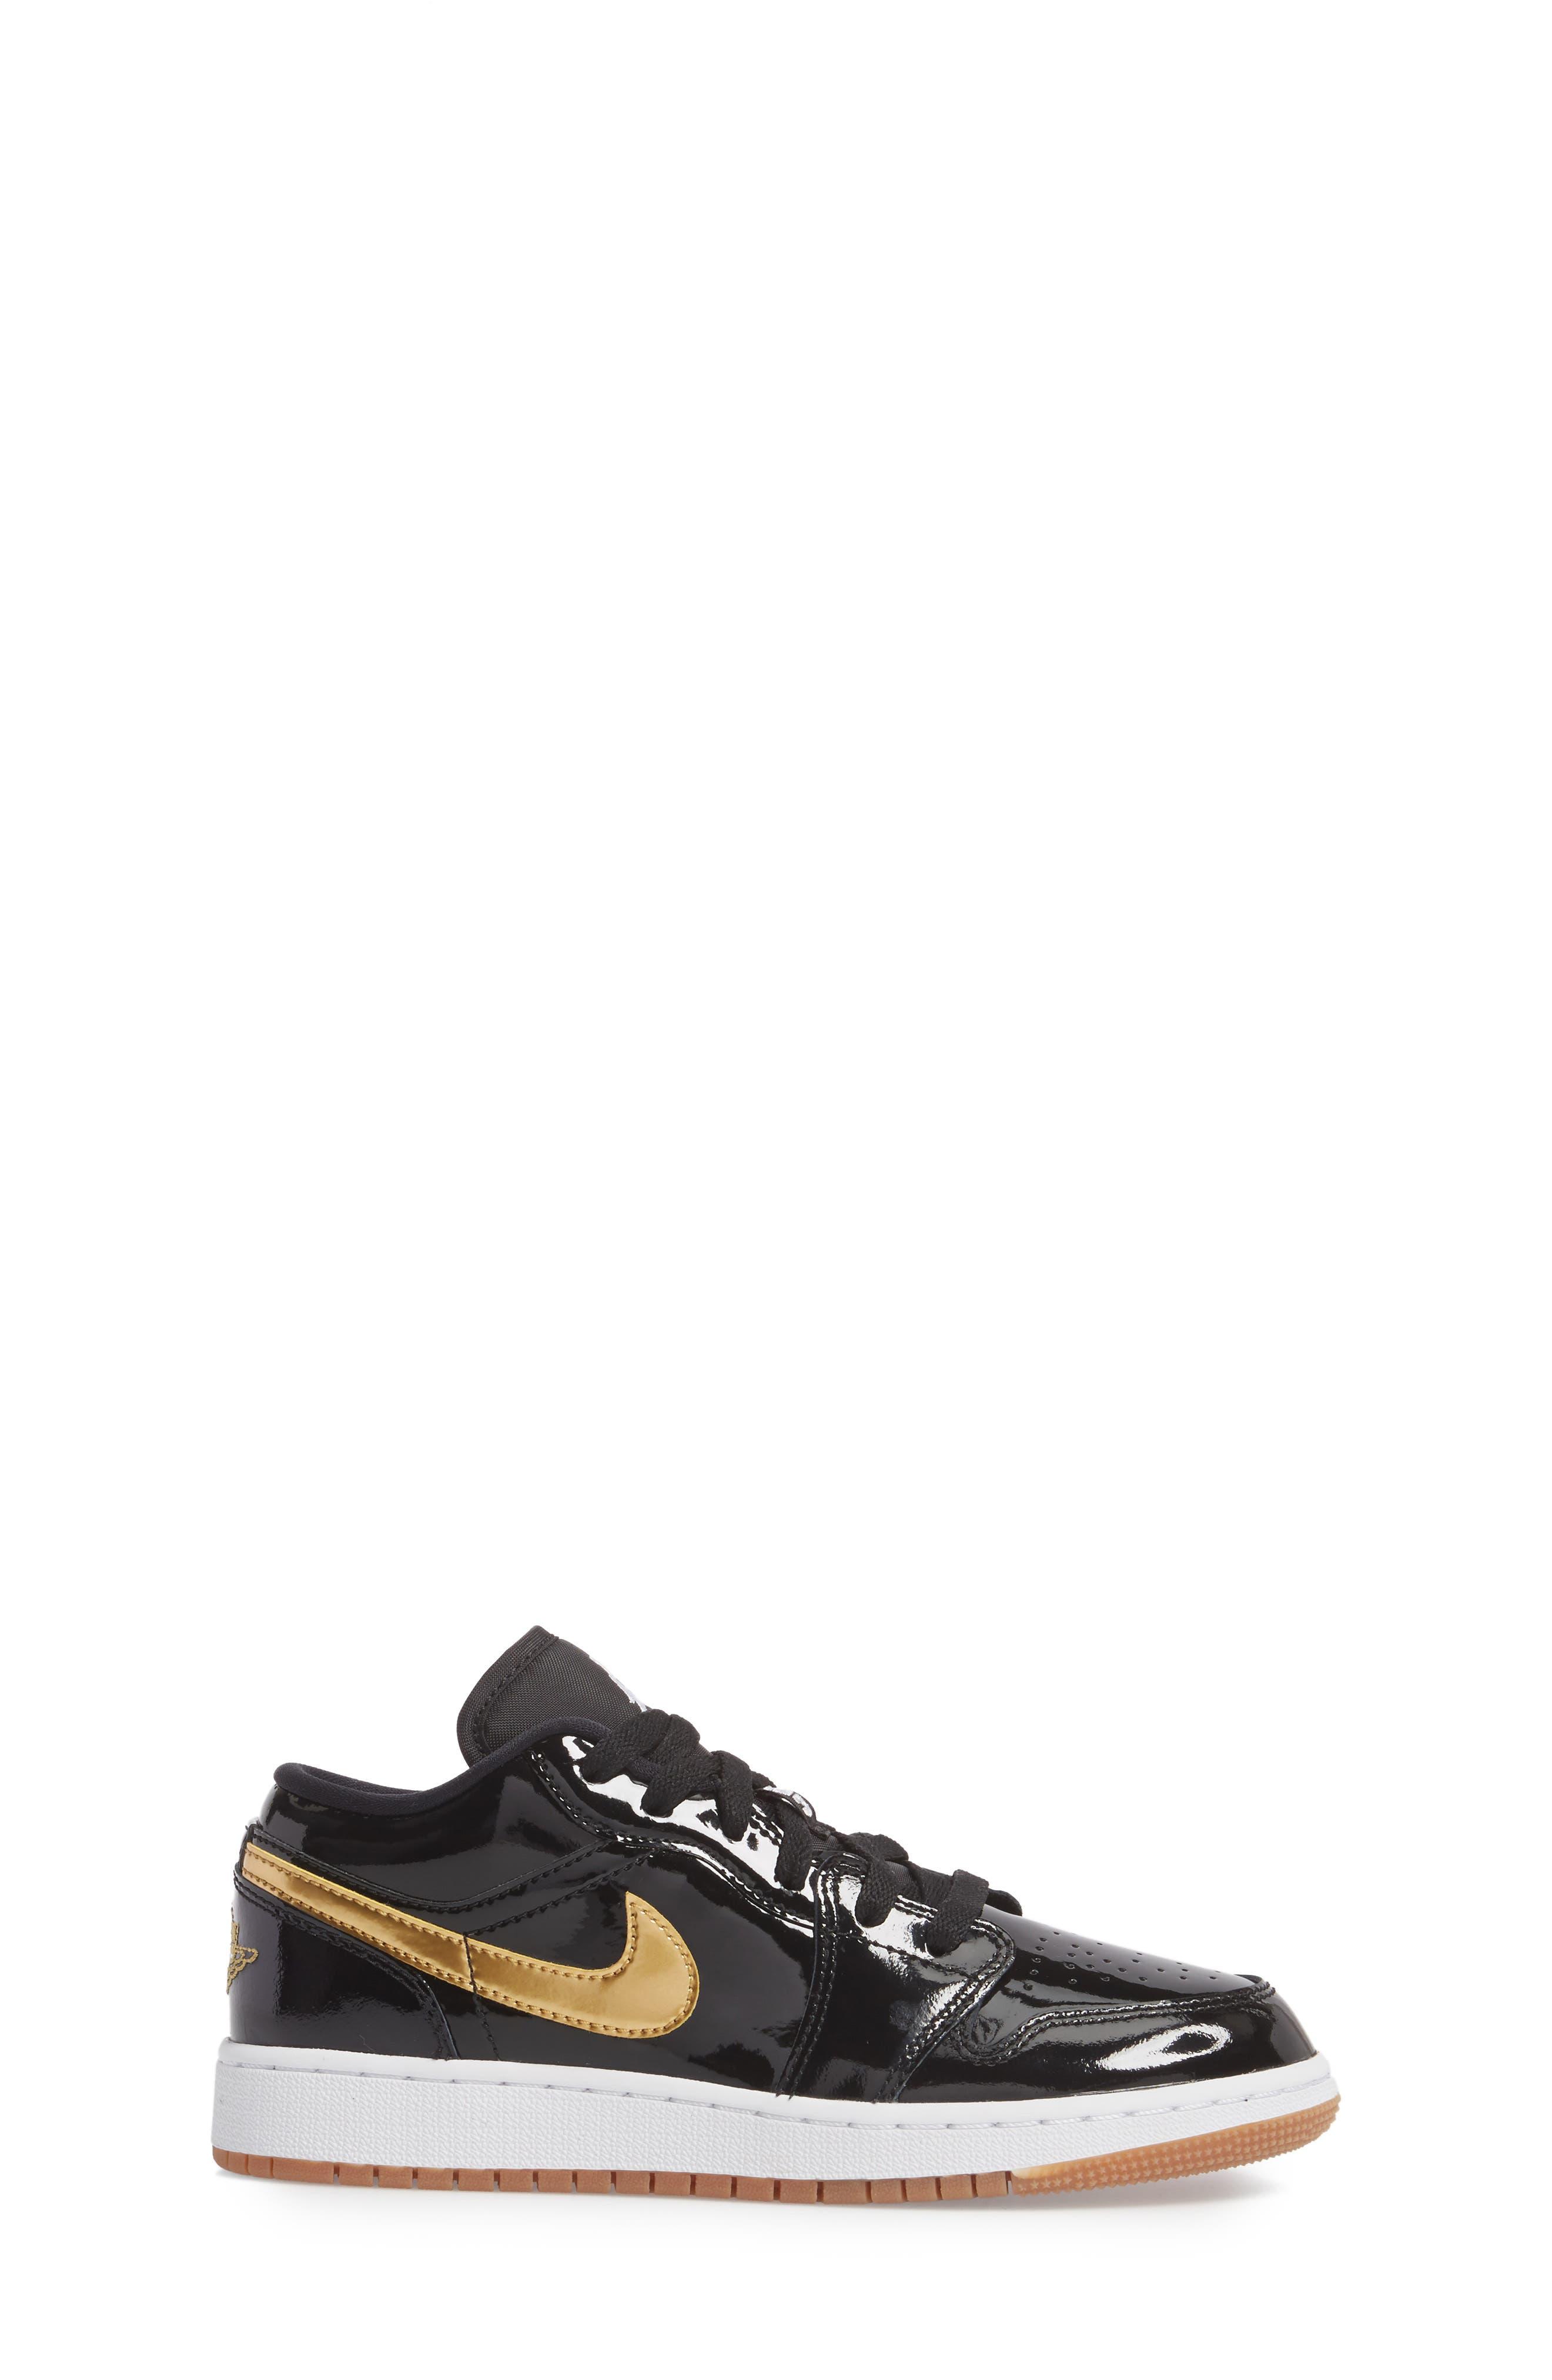 Nike 'Jordan 1 Low' Basketball Shoe,                             Alternate thumbnail 3, color,                             Black/ Metallic Gold/ White